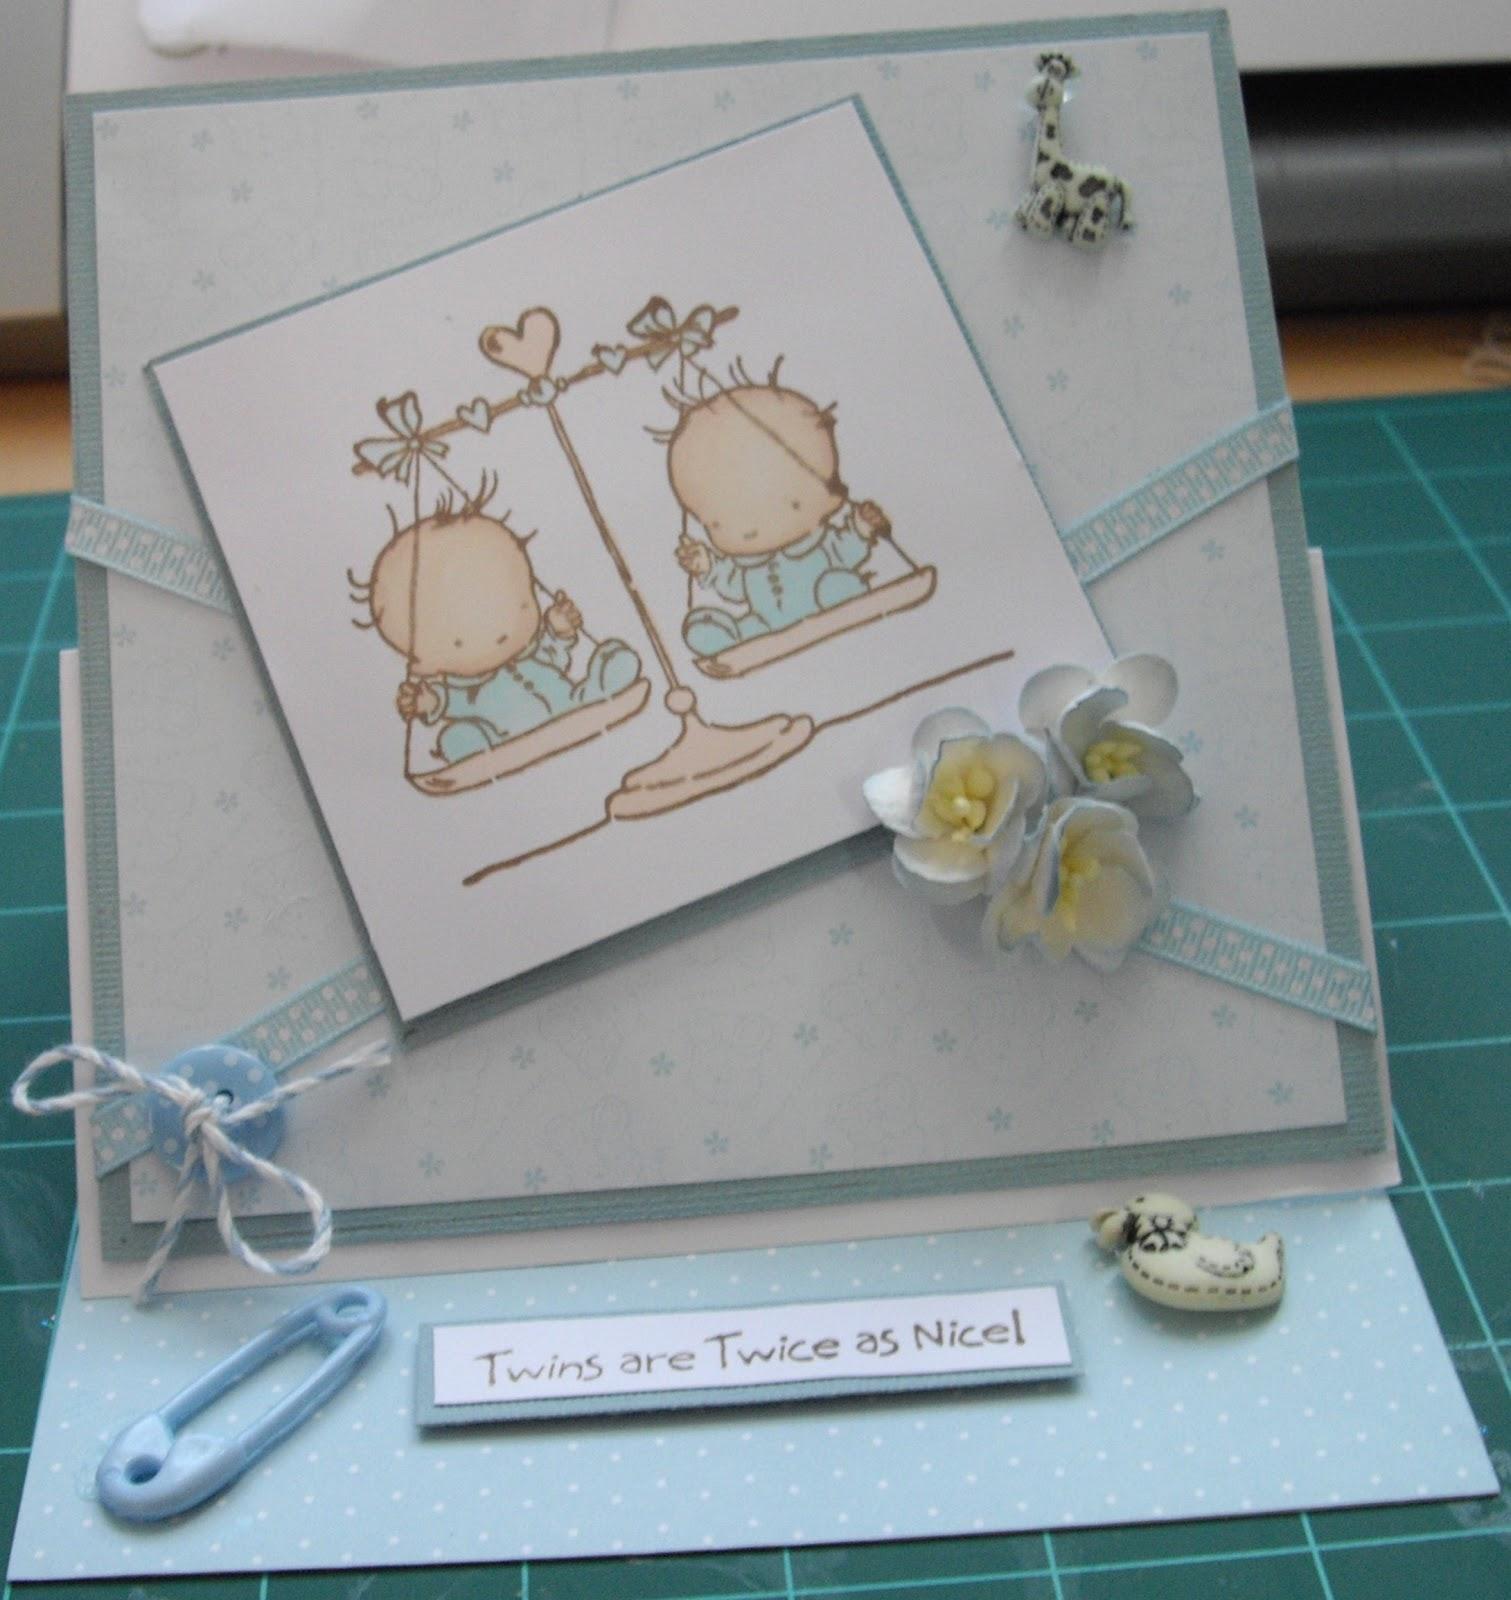 http://2.bp.blogspot.com/-R0N74VbS7Vw/URKHuvoOQxI/AAAAAAAAA8o/0ZRe22h3ppw/s1600/Baby+Card+38.jpg